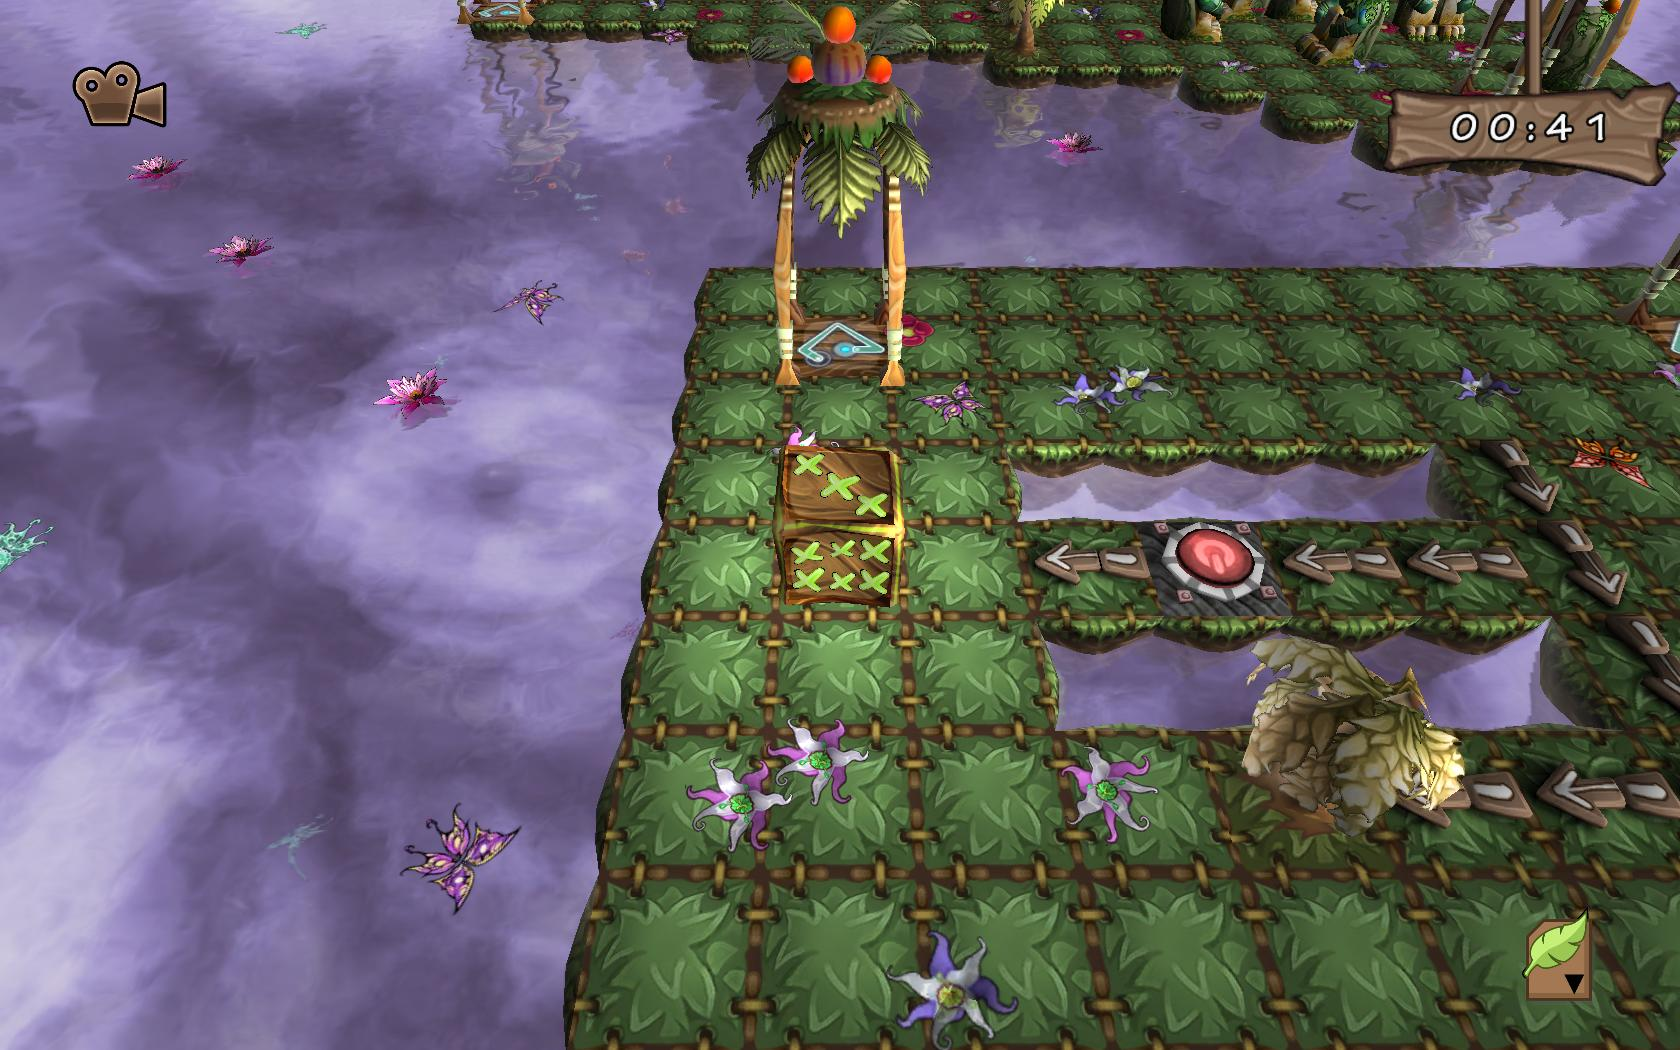 Voodoo Dice - Xbox 360